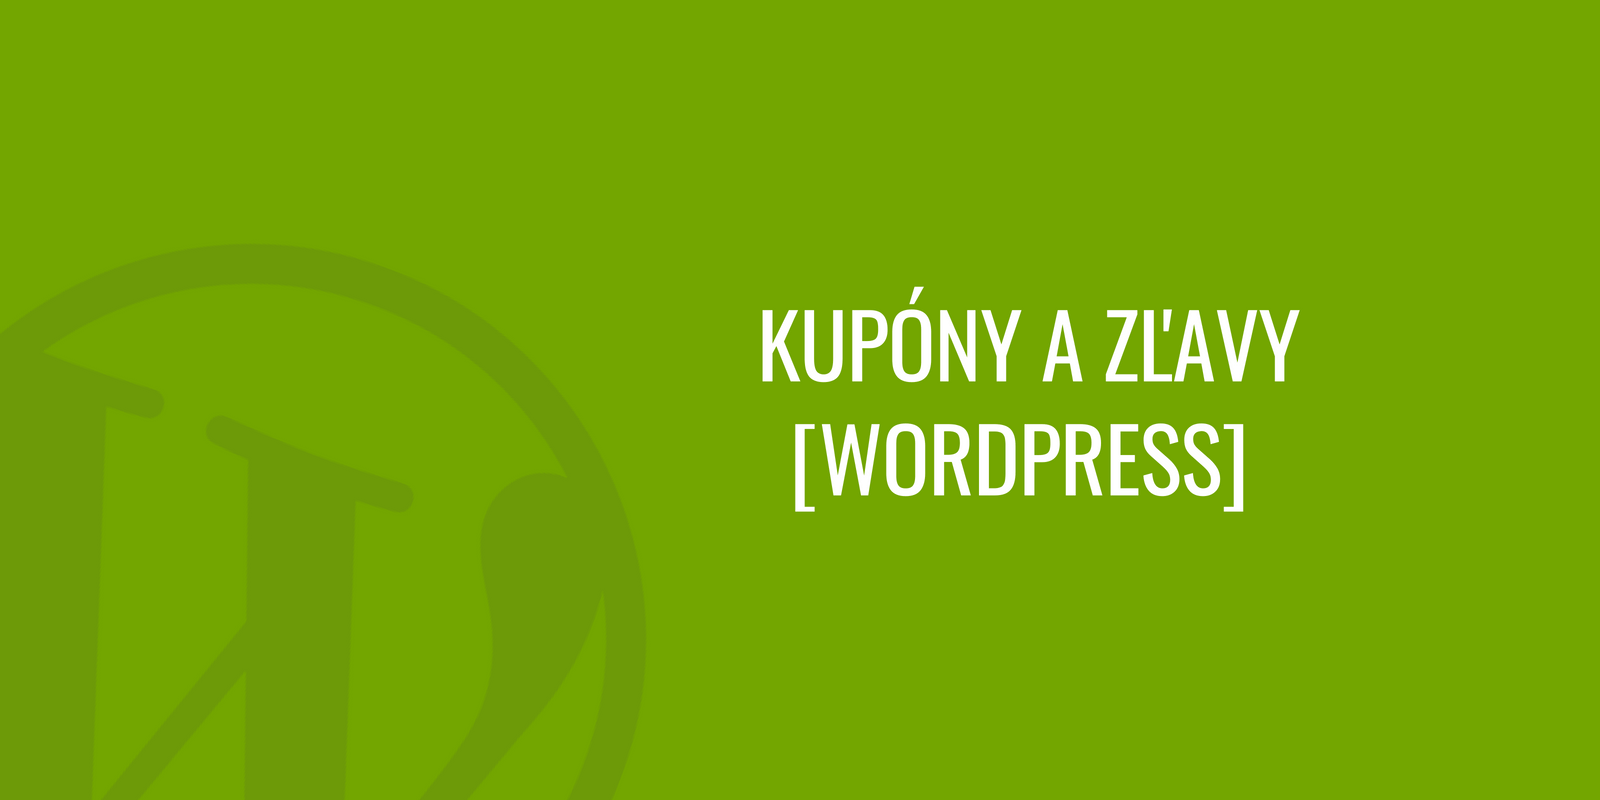 WordPress kupóny a zľavy